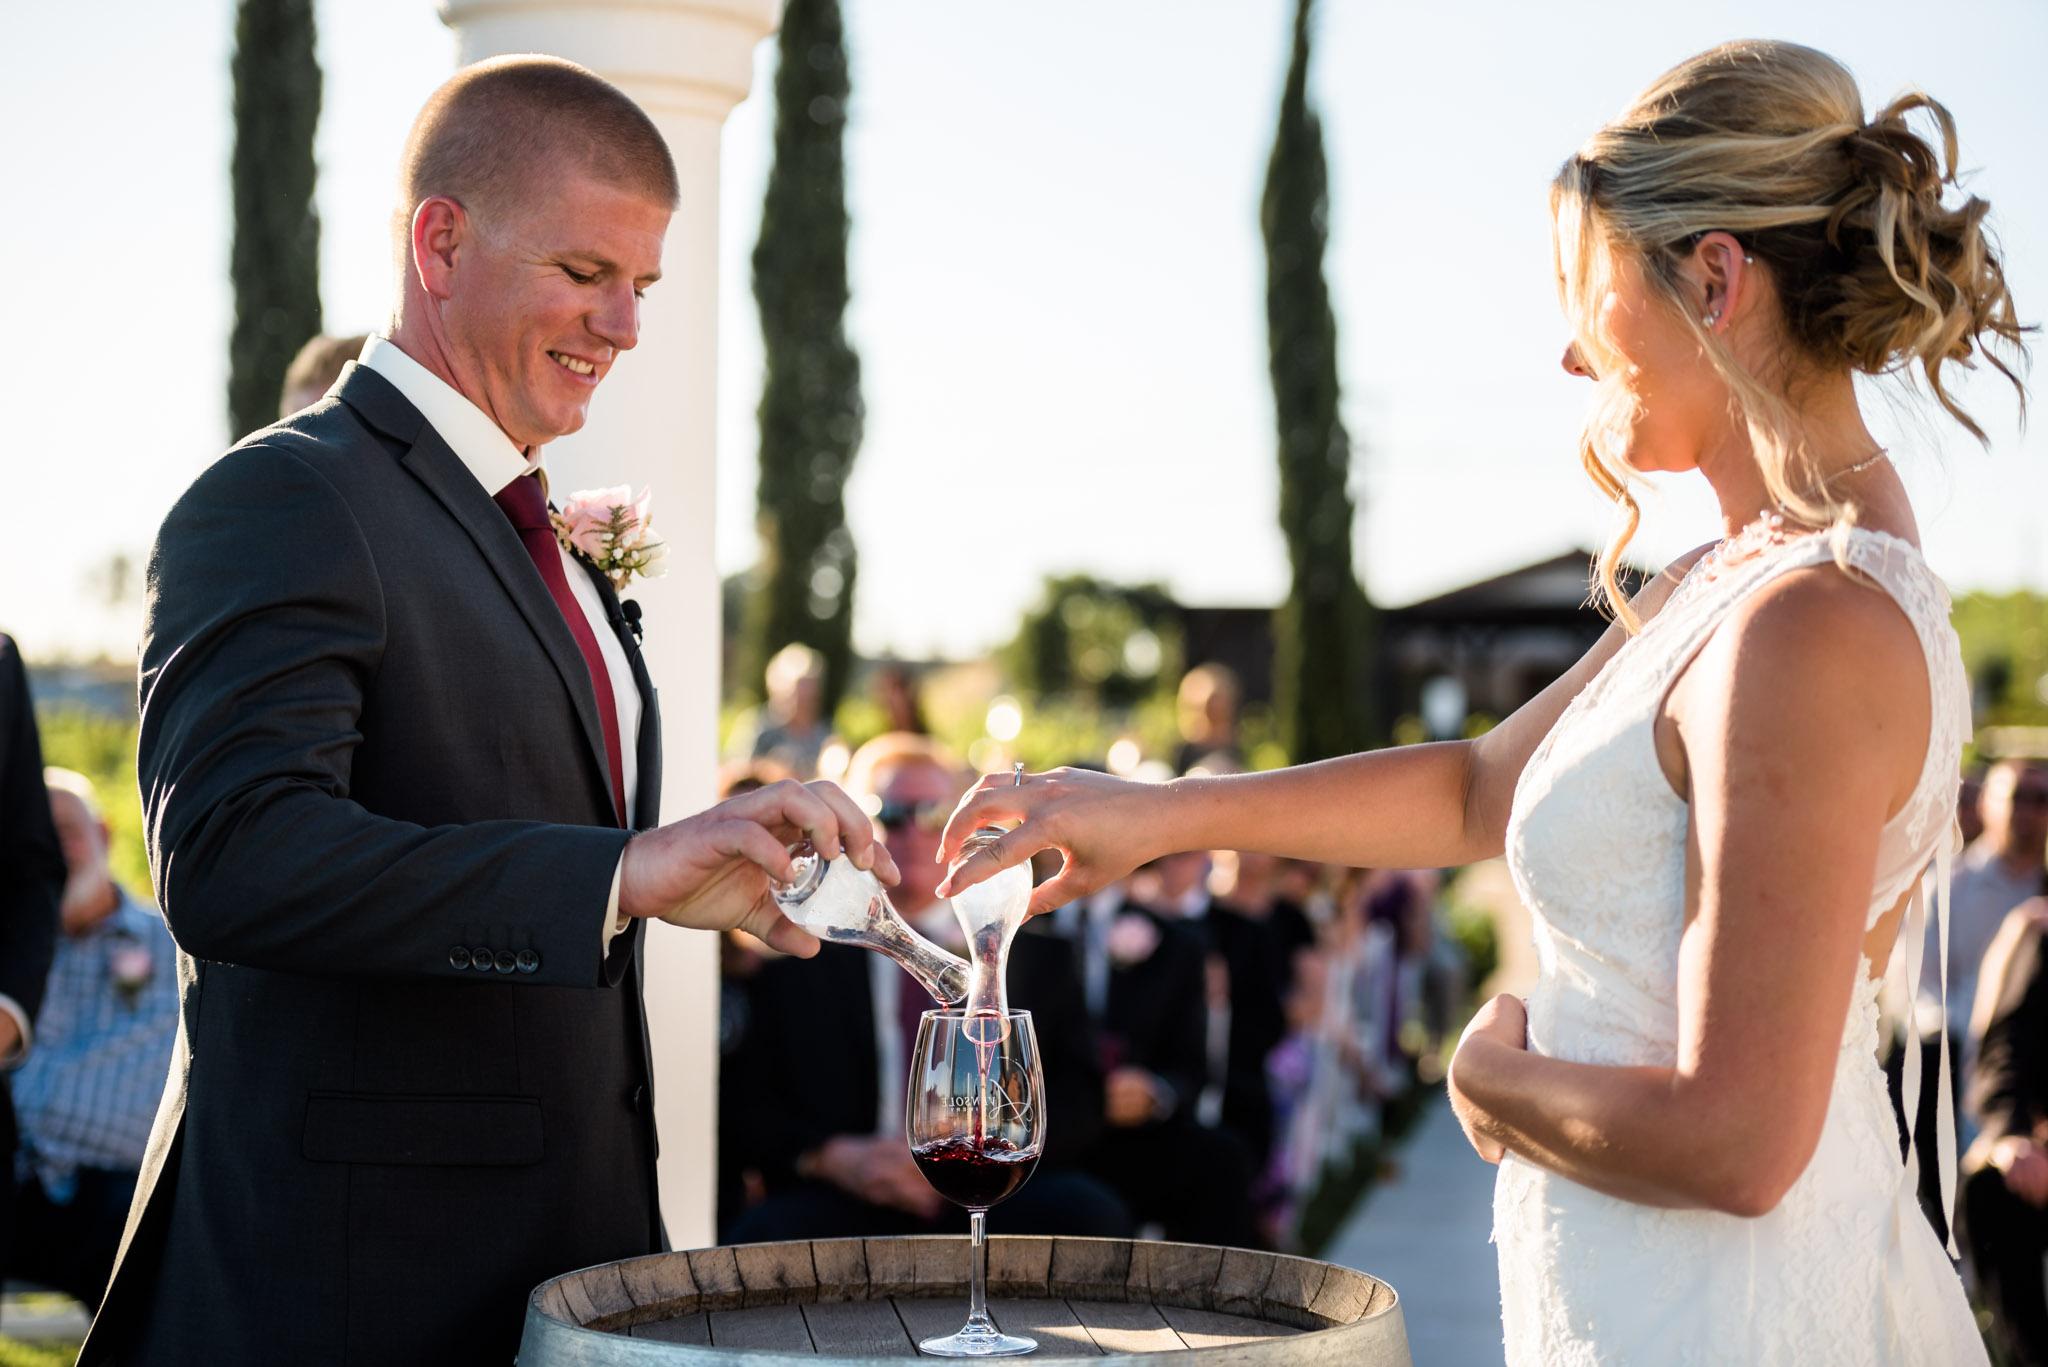 Avensole-Winery-Temecula-Wedding-Josh-and-Olivia-3539.JPG